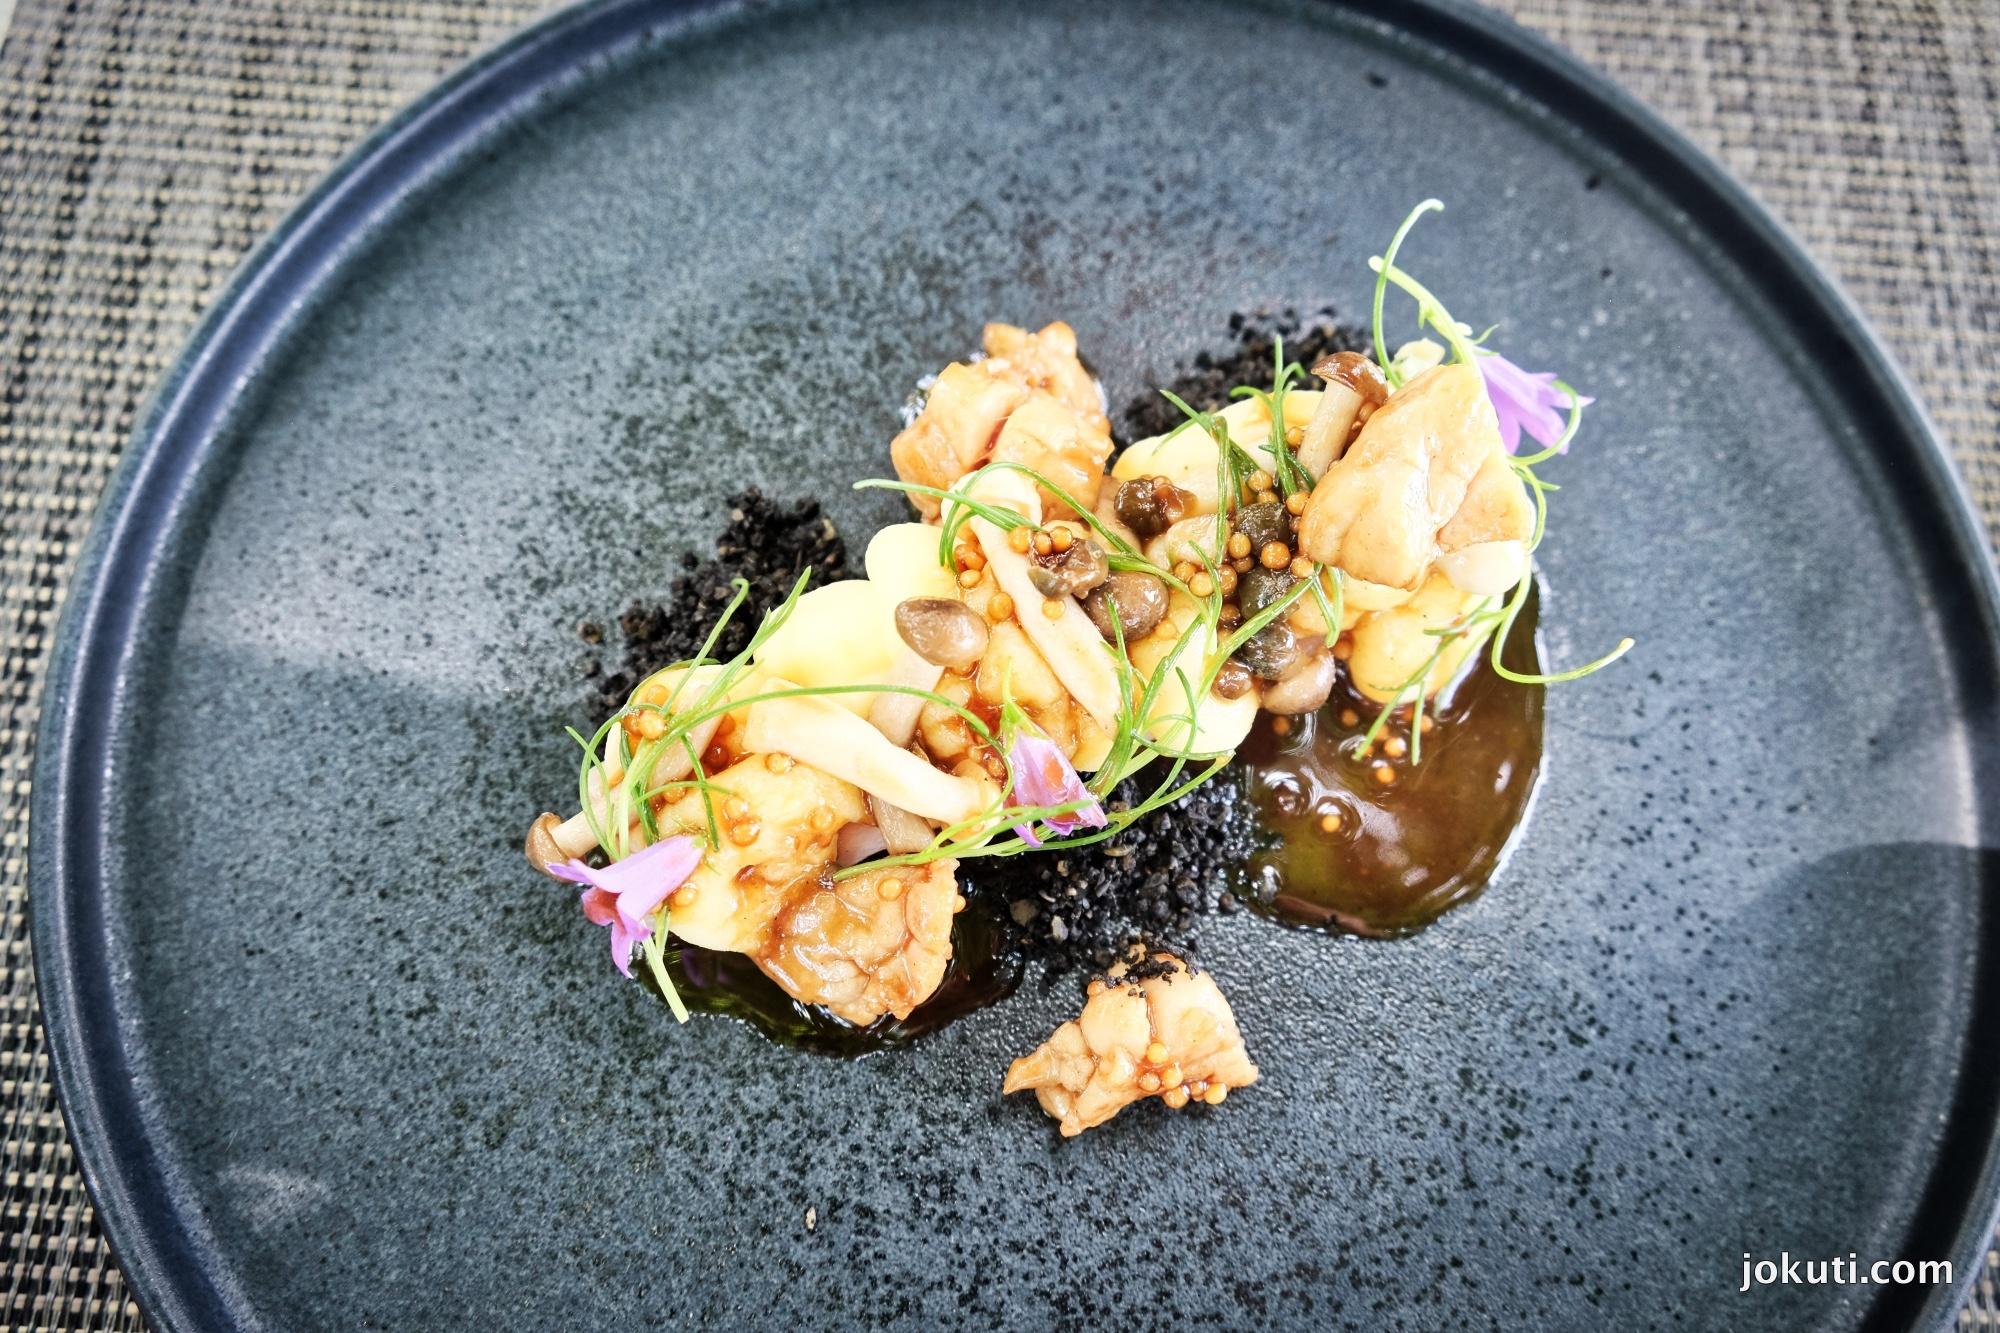 dscf6947_platan_tata_pesti_restaurant_denmark_vilagevo_jokuti_andras_l_l.jpg